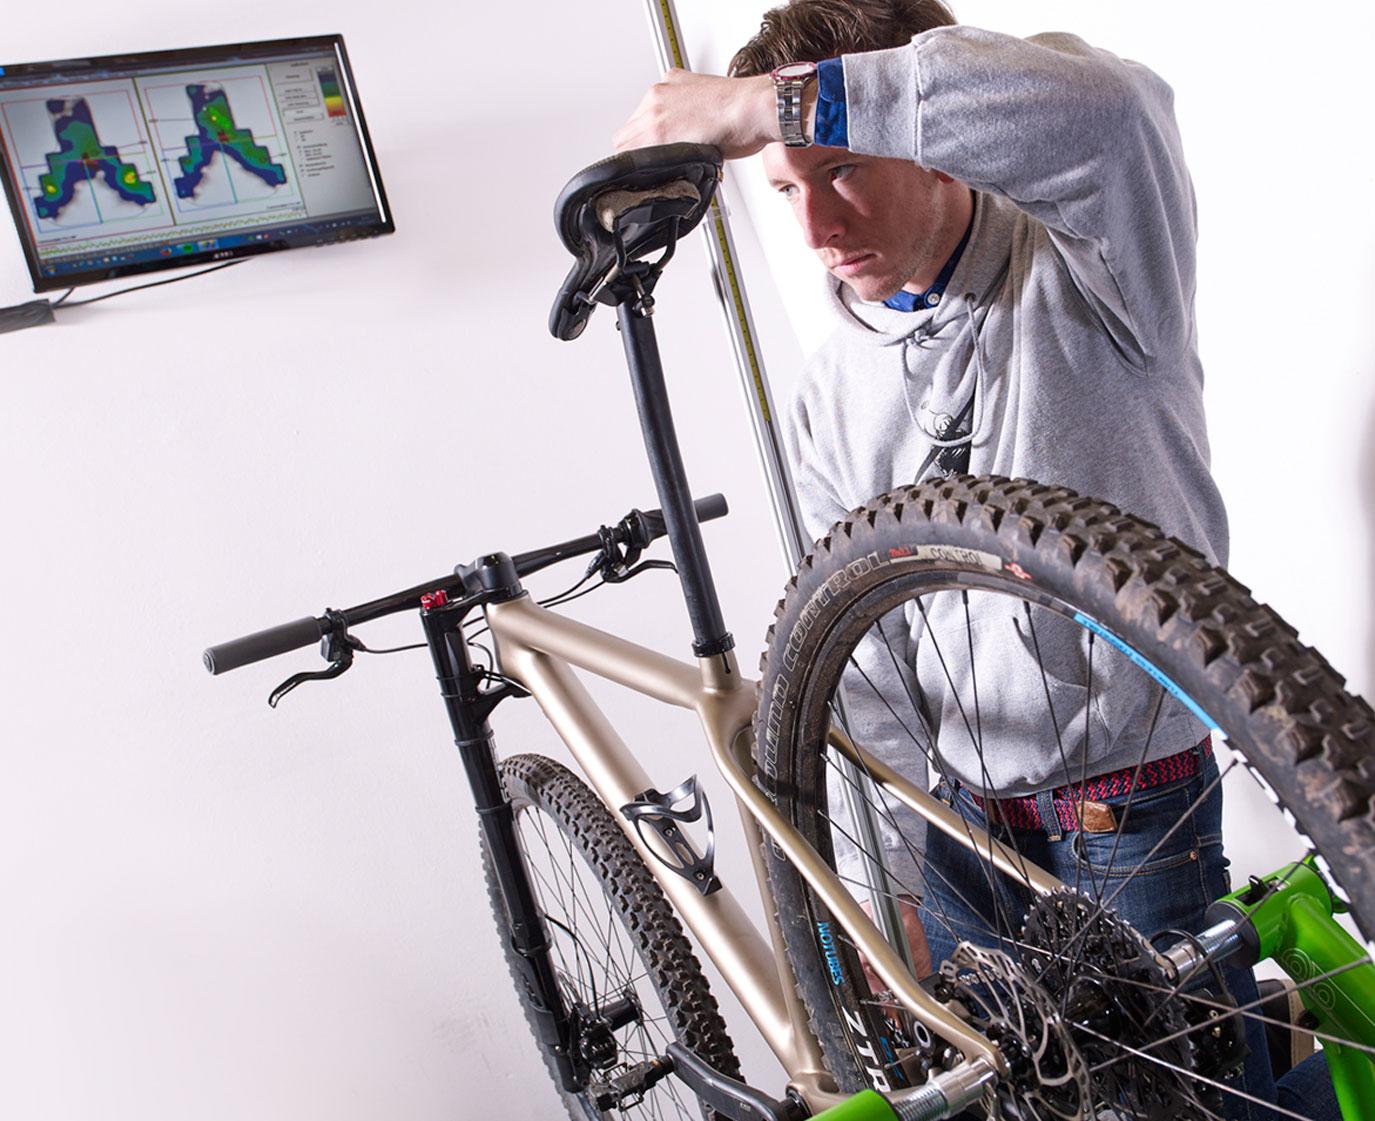 bikefitting-saar-trishop-02.jpg